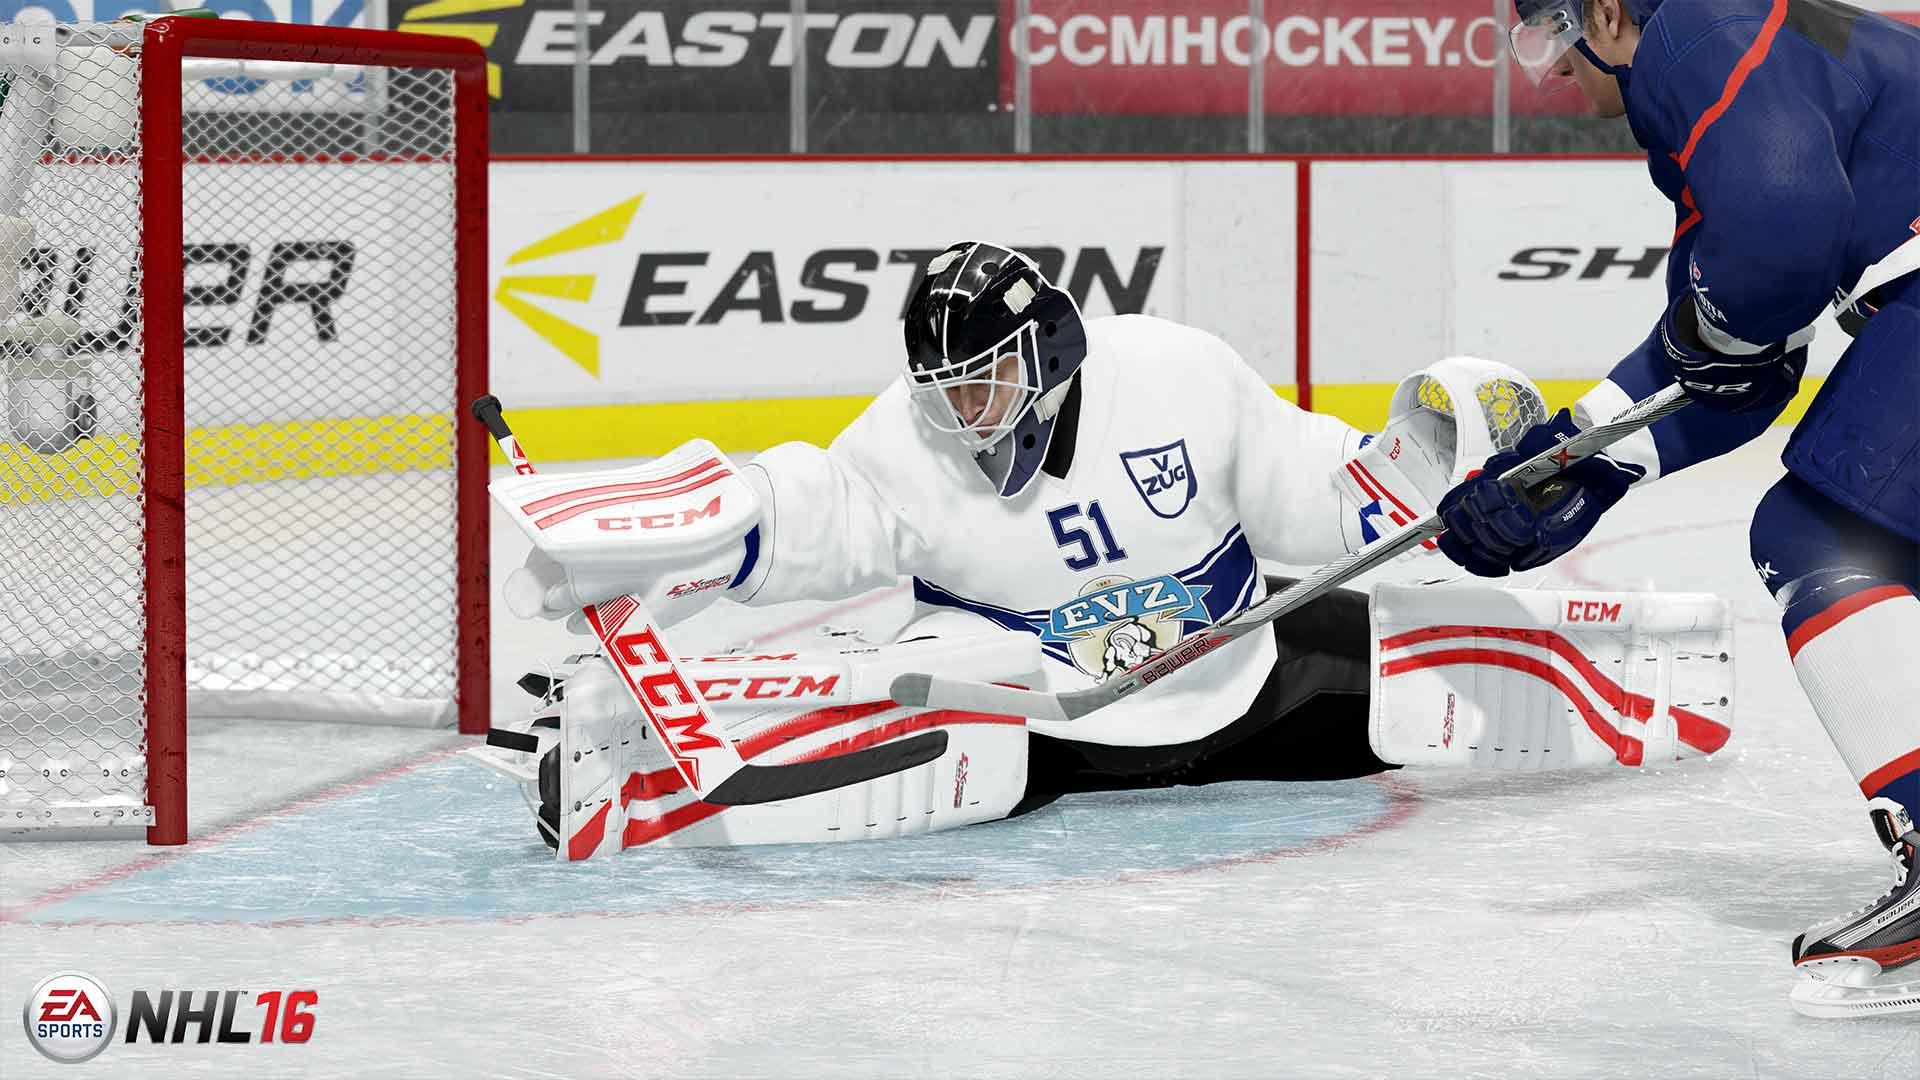 NHL16-EU-EVZug-away-1-1920x1080-WM